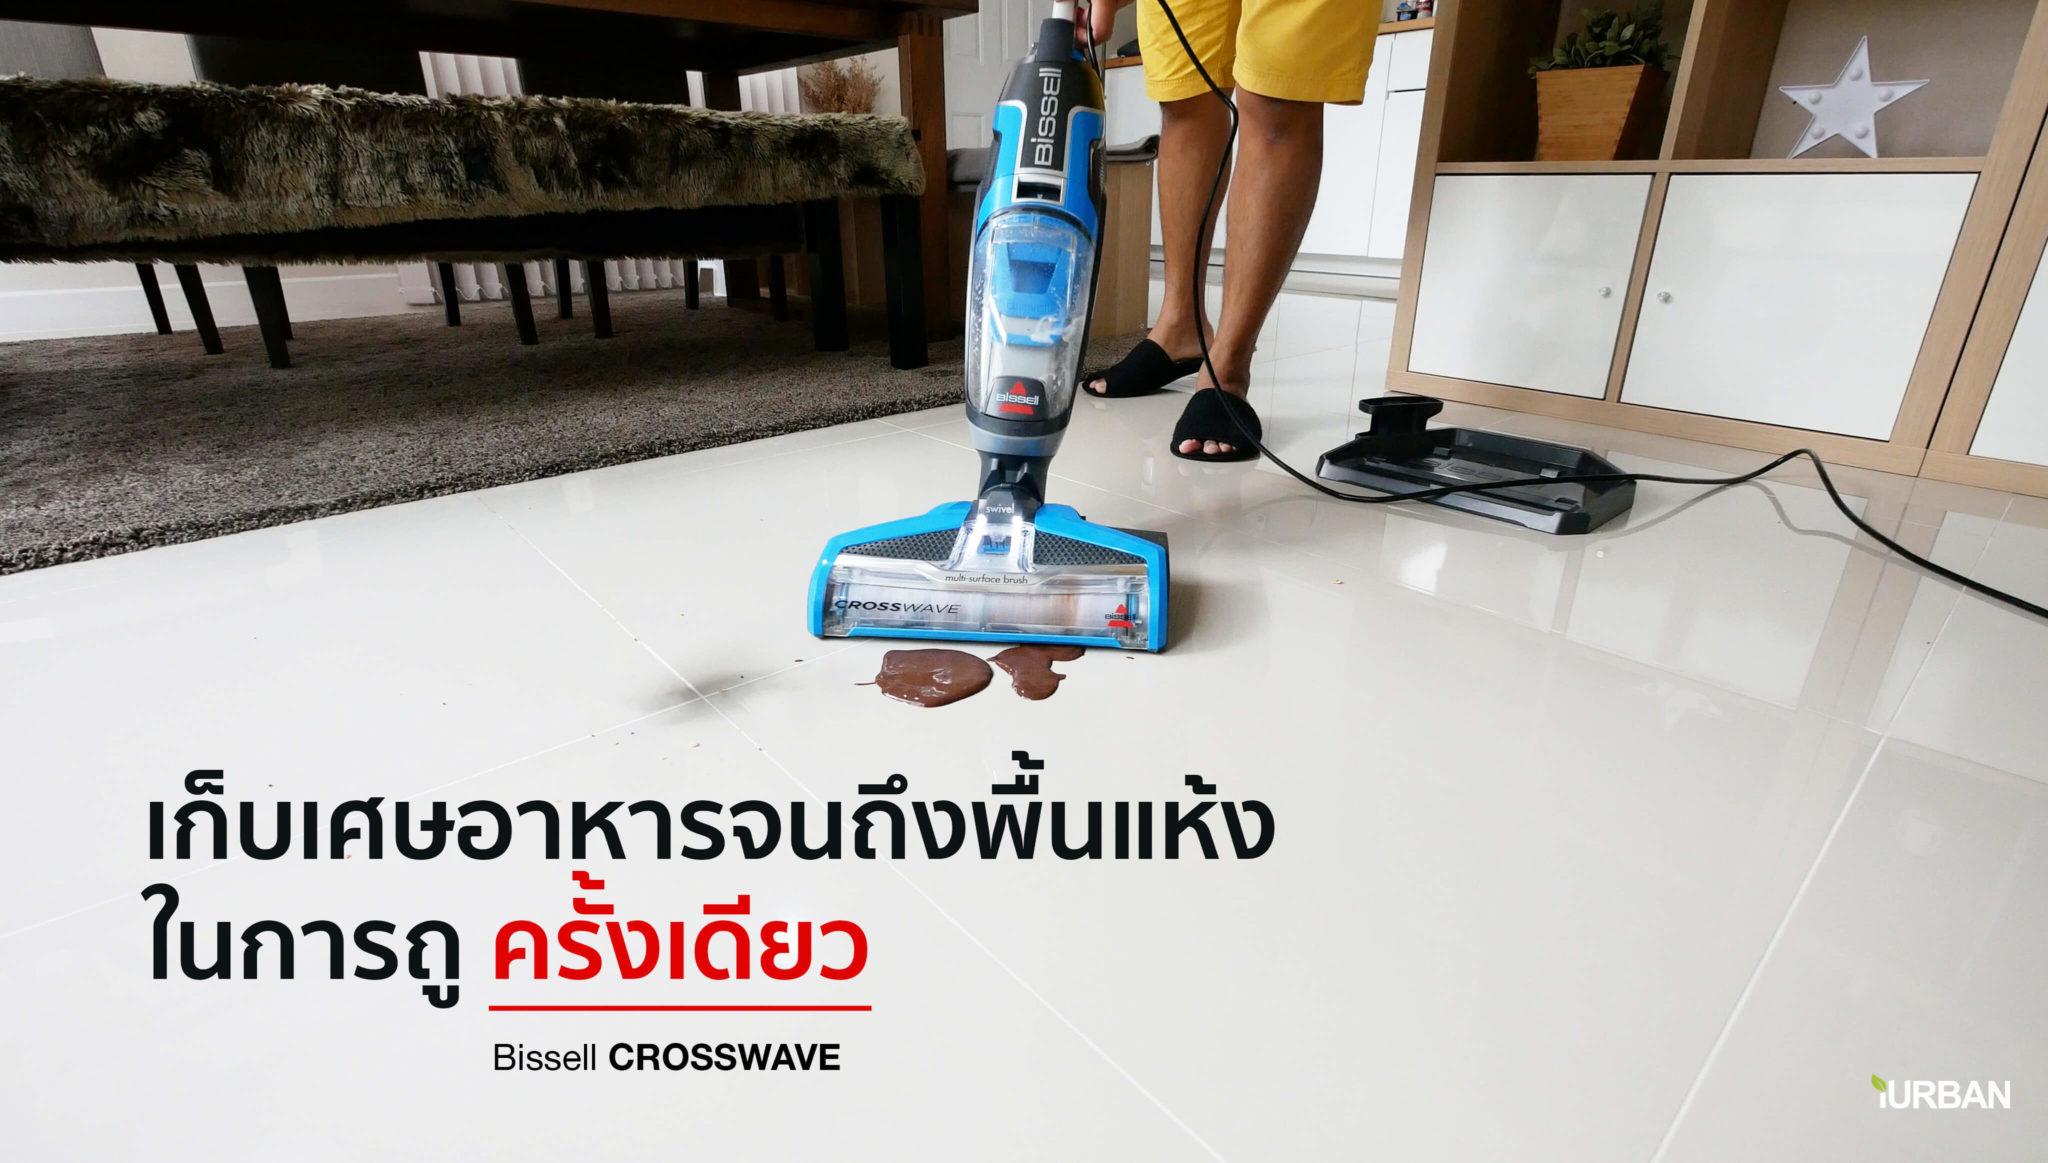 "Bissell Crosswave รีวิวนวัตกรรมเครื่องทำความสะอาด 3-in-1 ดูดเปียก-ล้าง-ถูแห้ง ""ในครั้งเดียว"" 13 - Bissell"